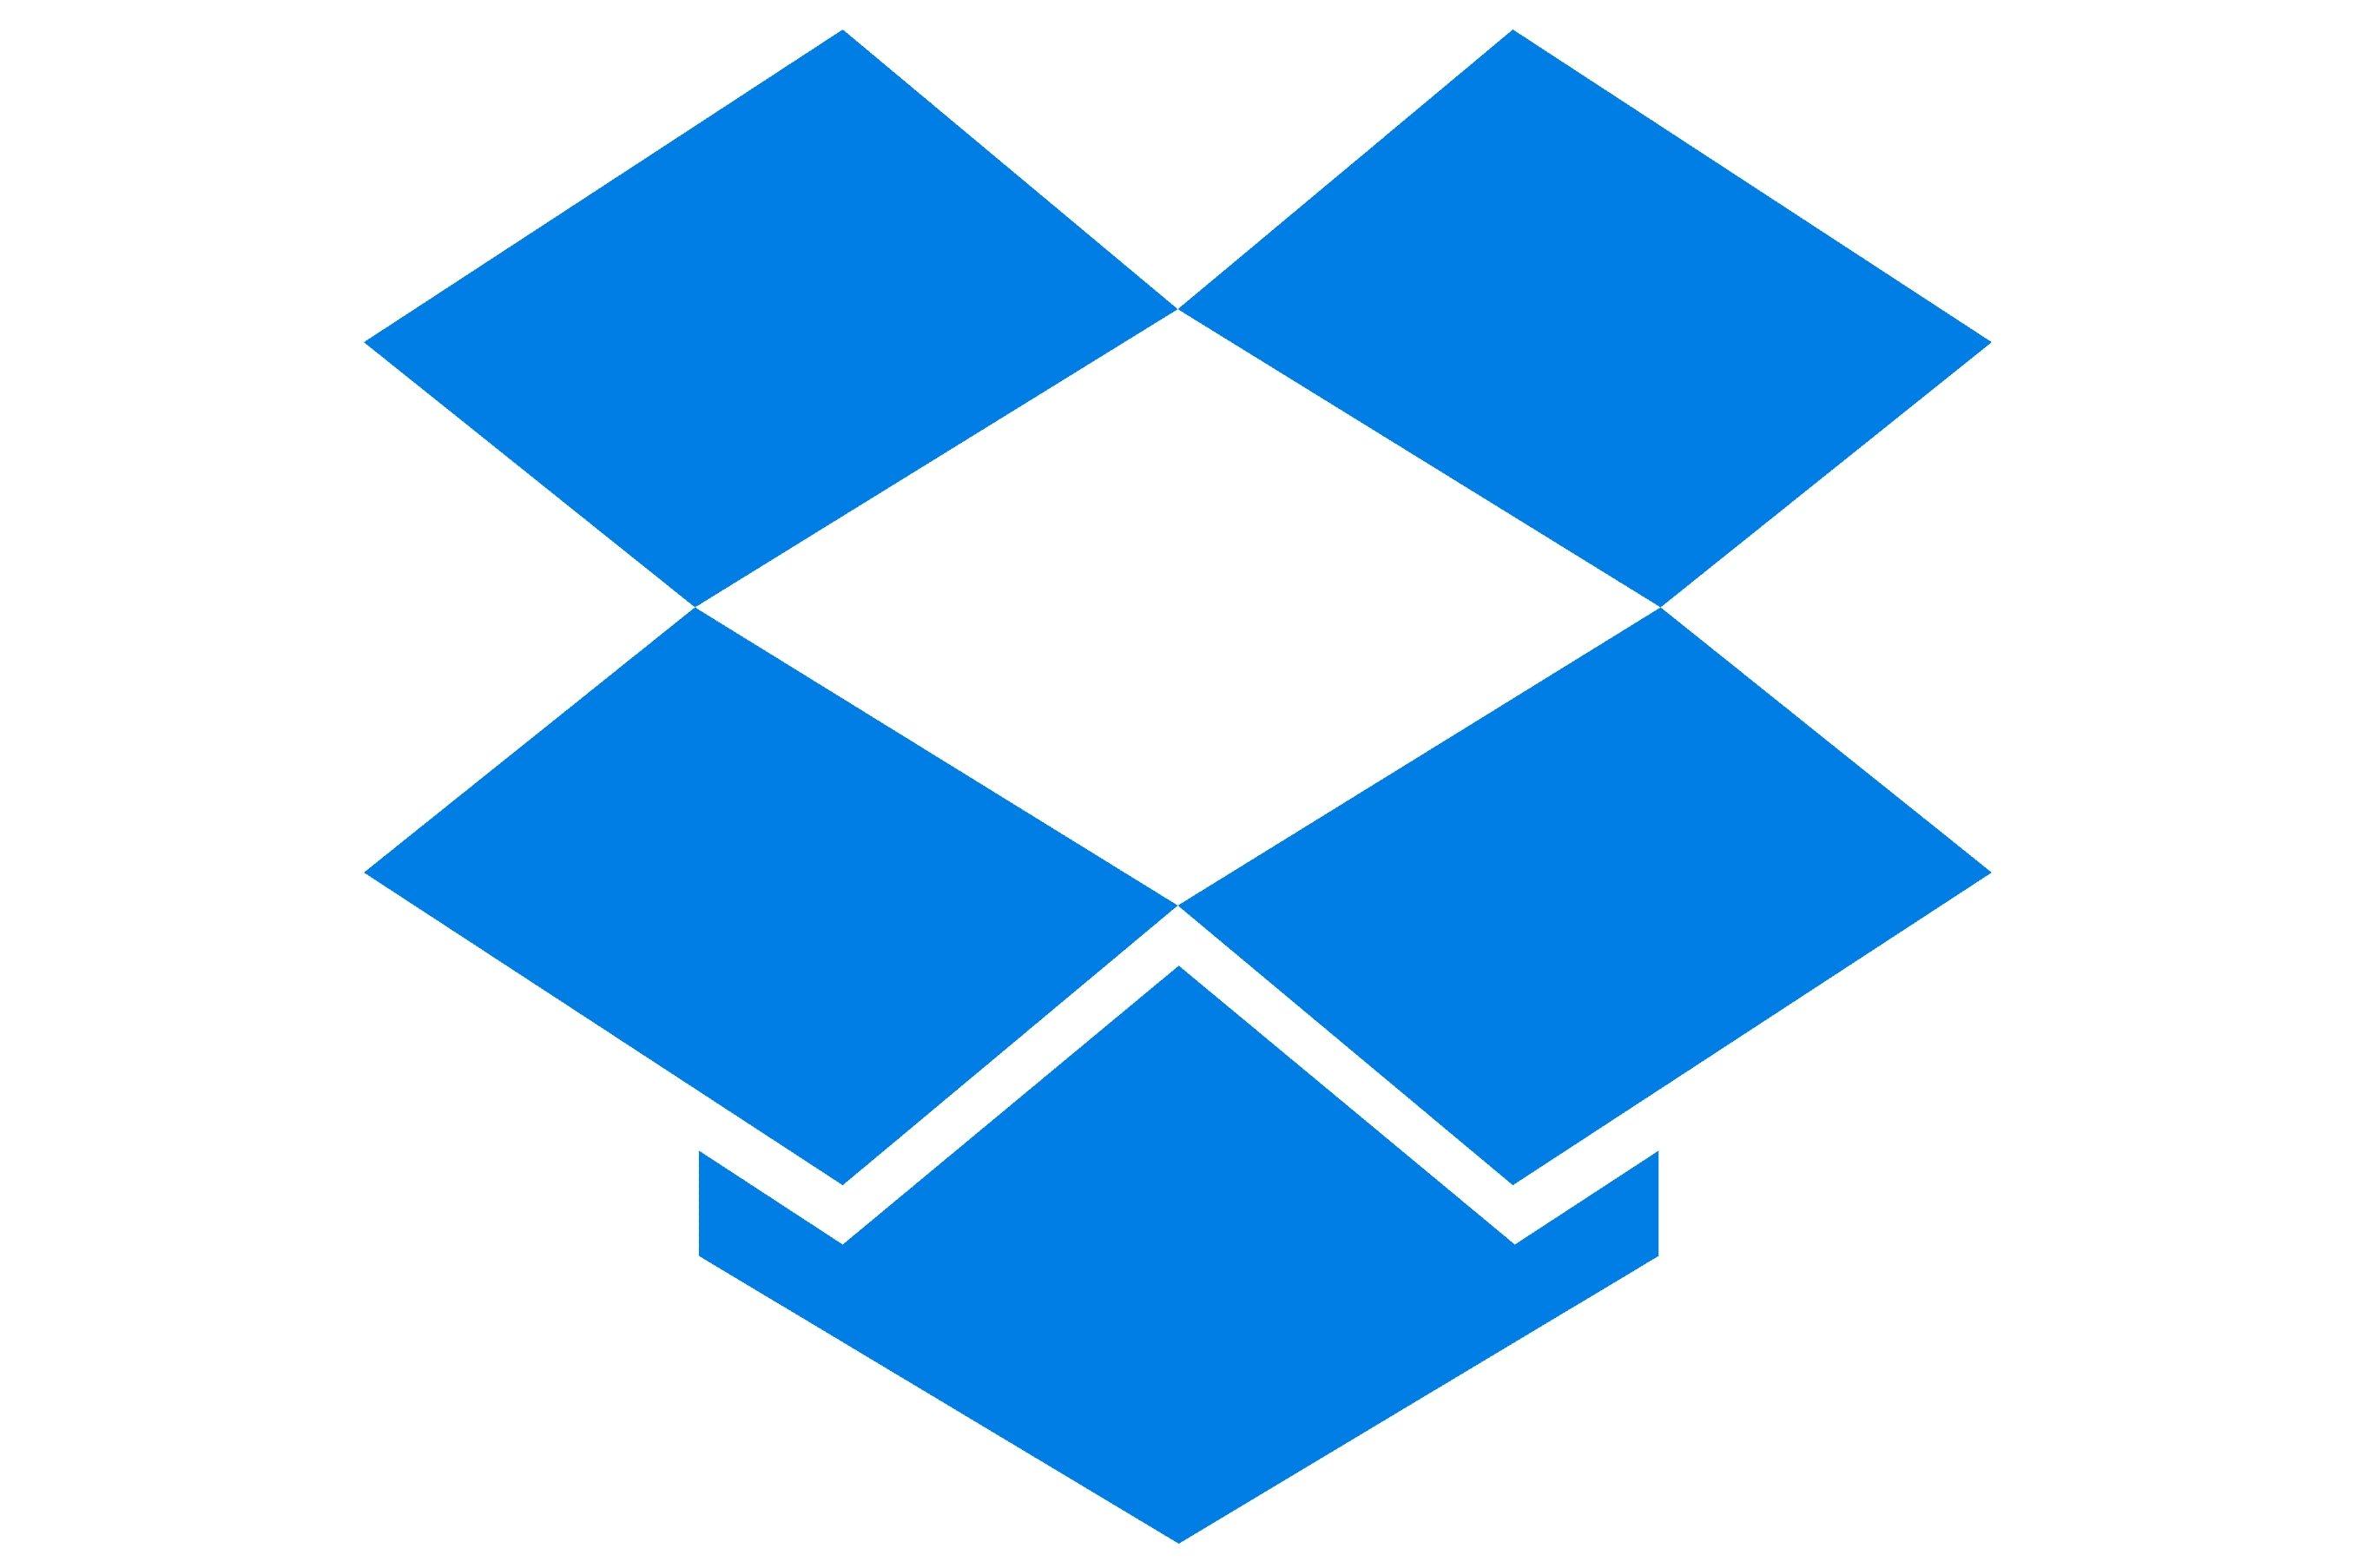 dropbox icone